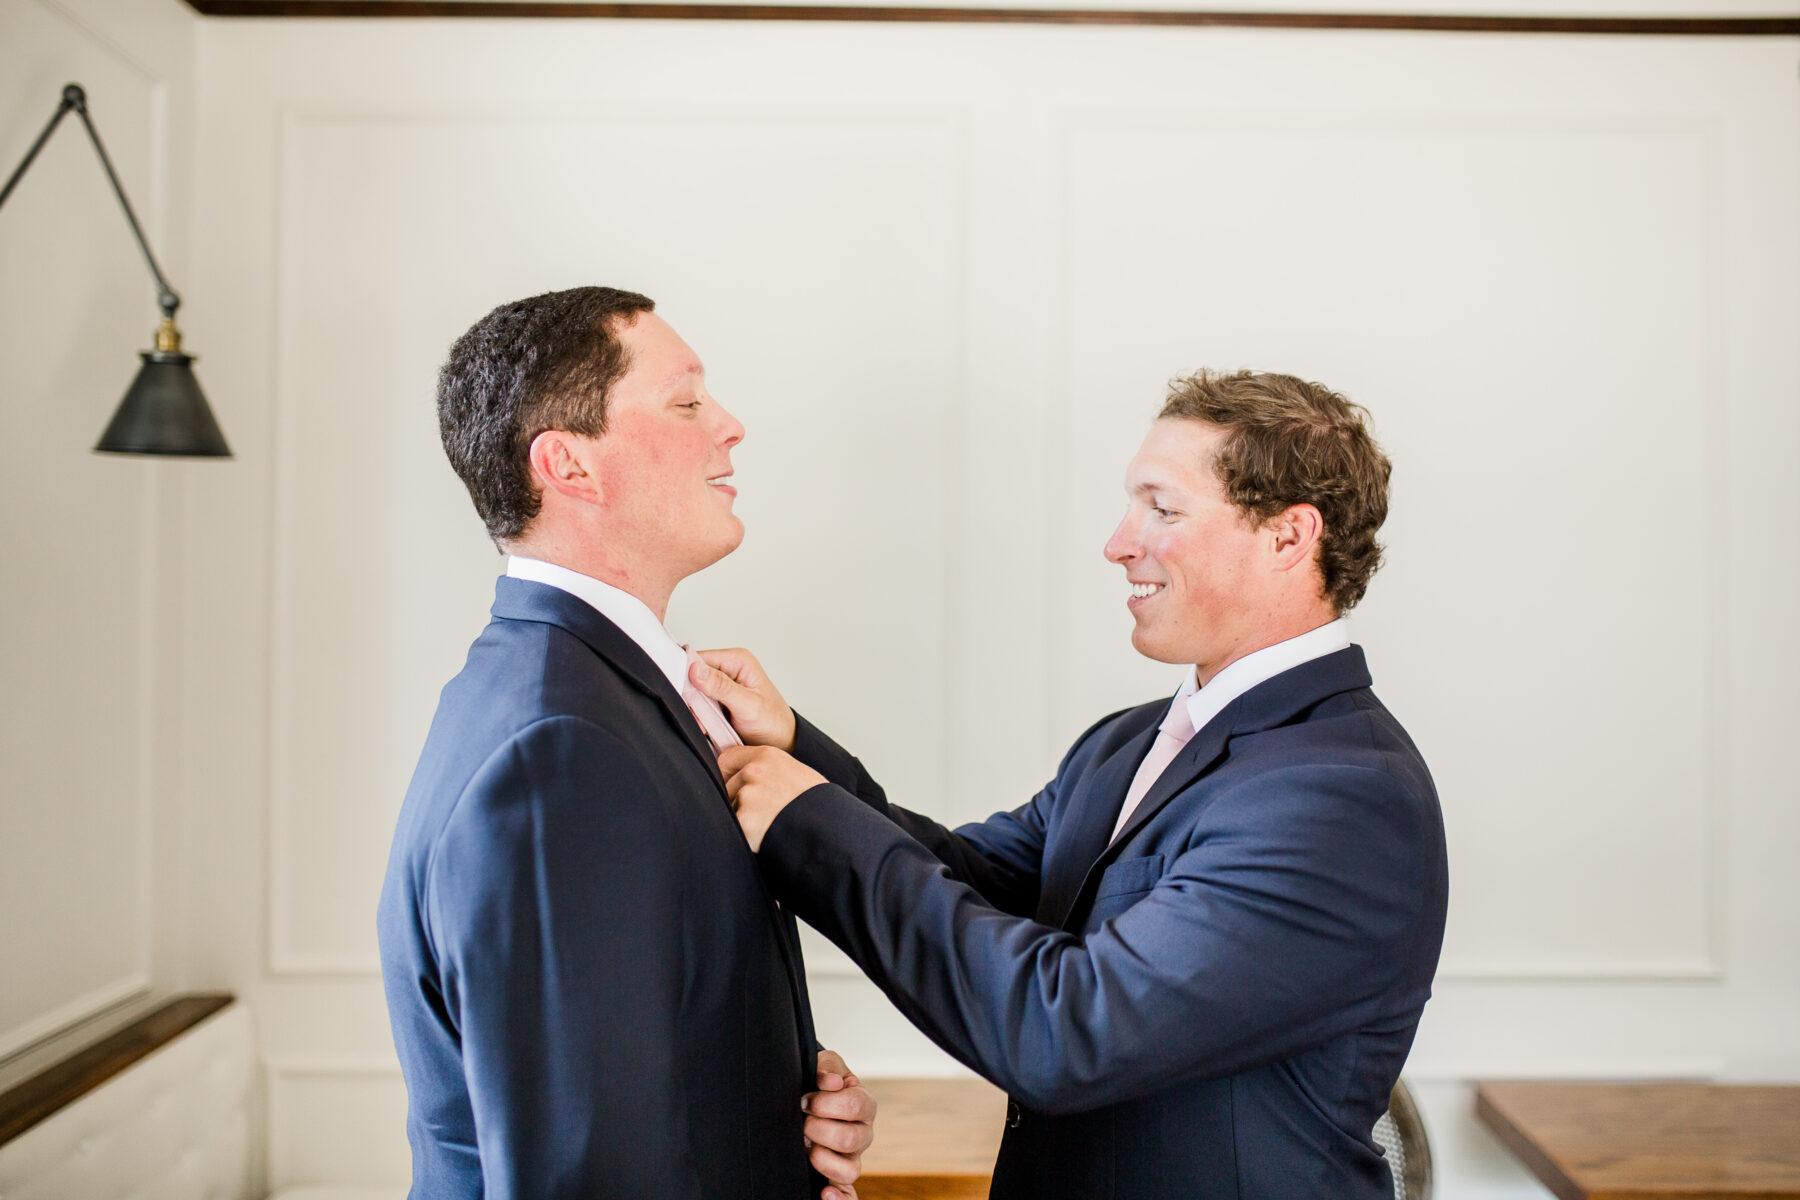 Navy blue grooms tuxedo | Nashville Bride Guide